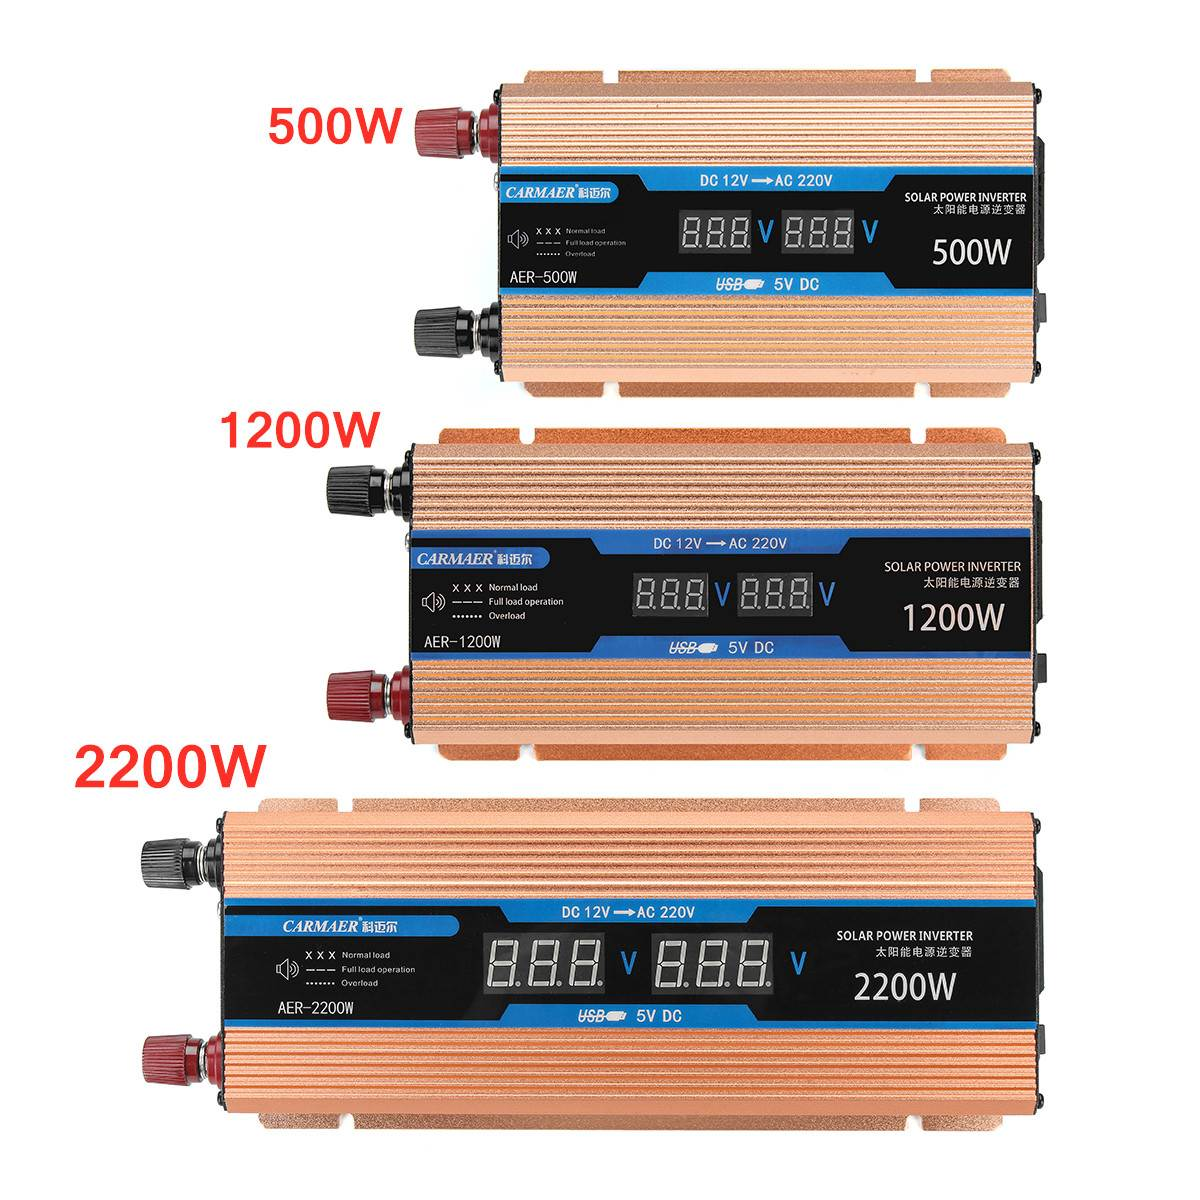 Double LCD Display Inverter 500/1200/2200W DC 12V/AC 220V Voltage Transformer Modified Sine Wave Power Inverter Smart Car Power